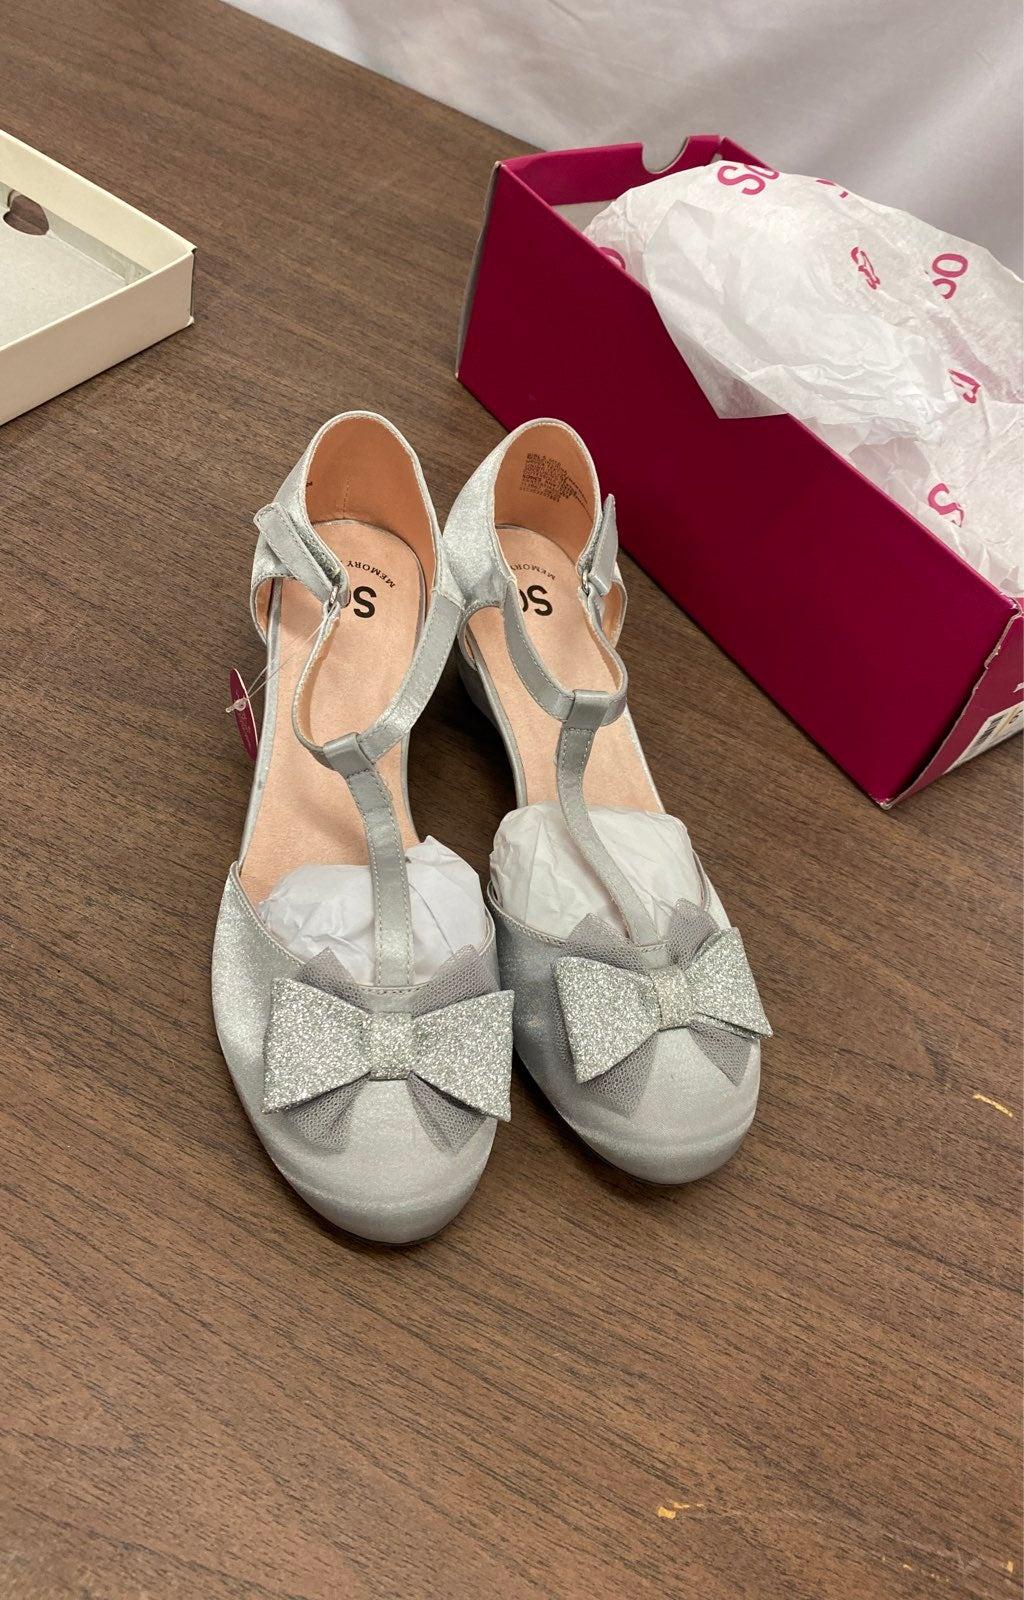 womens heels size 6 (b1-15)